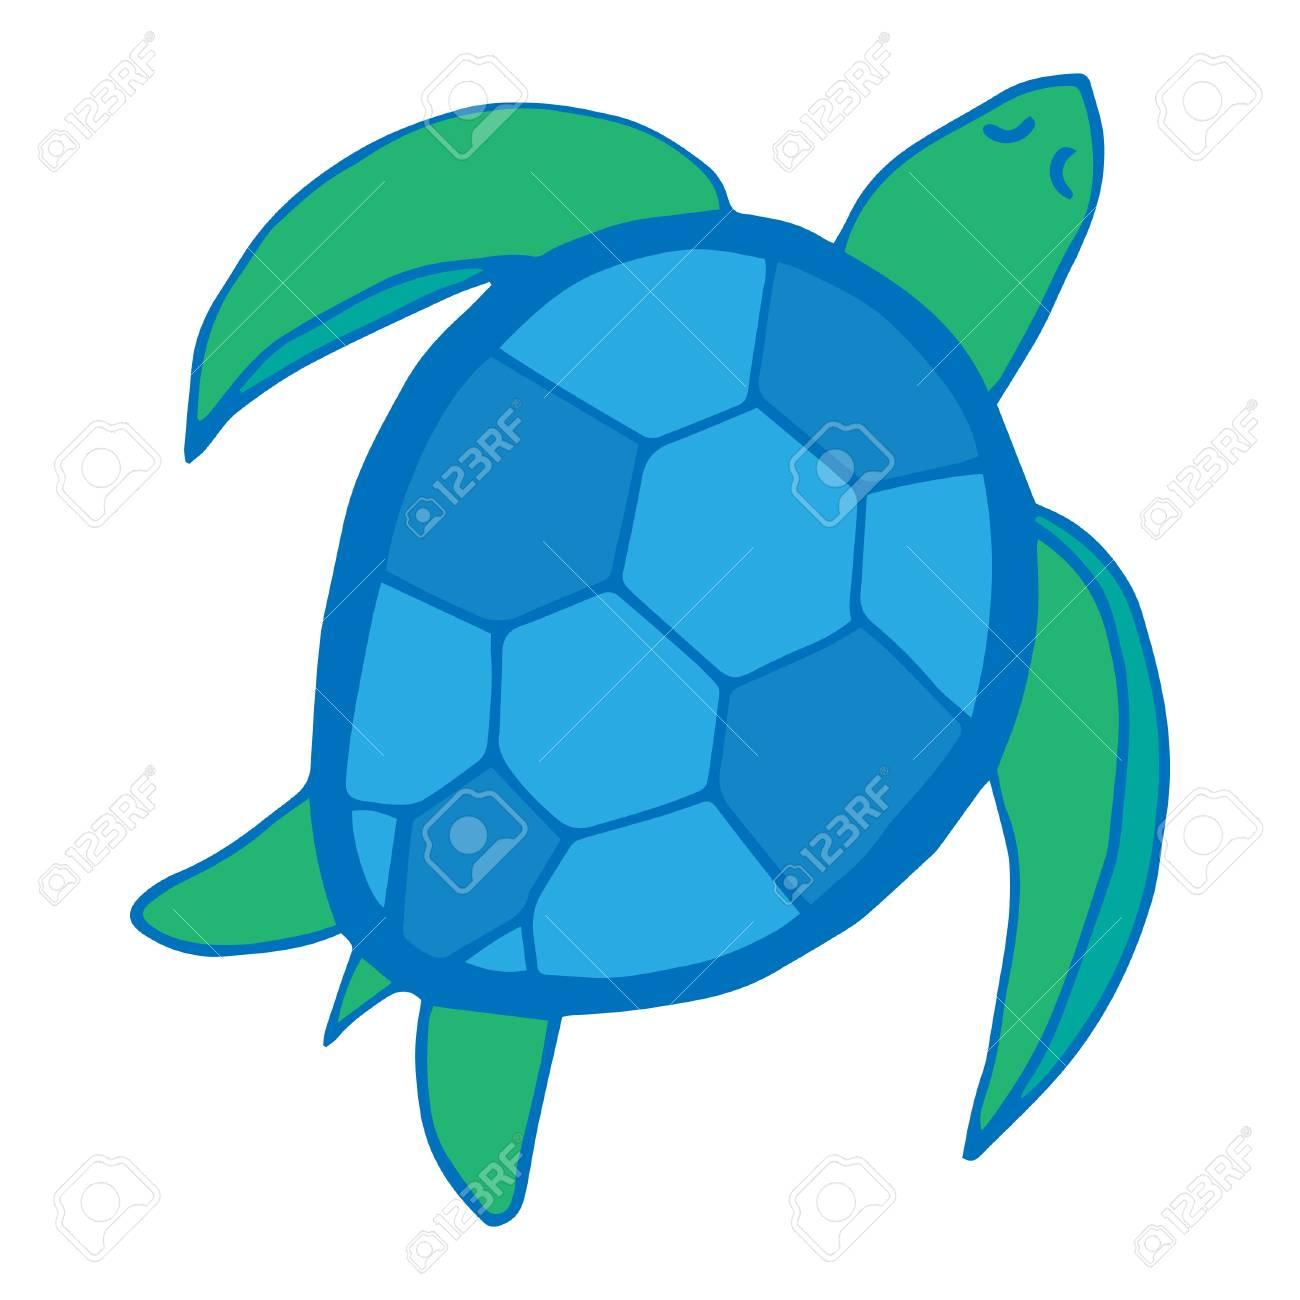 Sea Turtle Marine Animal Illustration Doodle Drawing In Blue